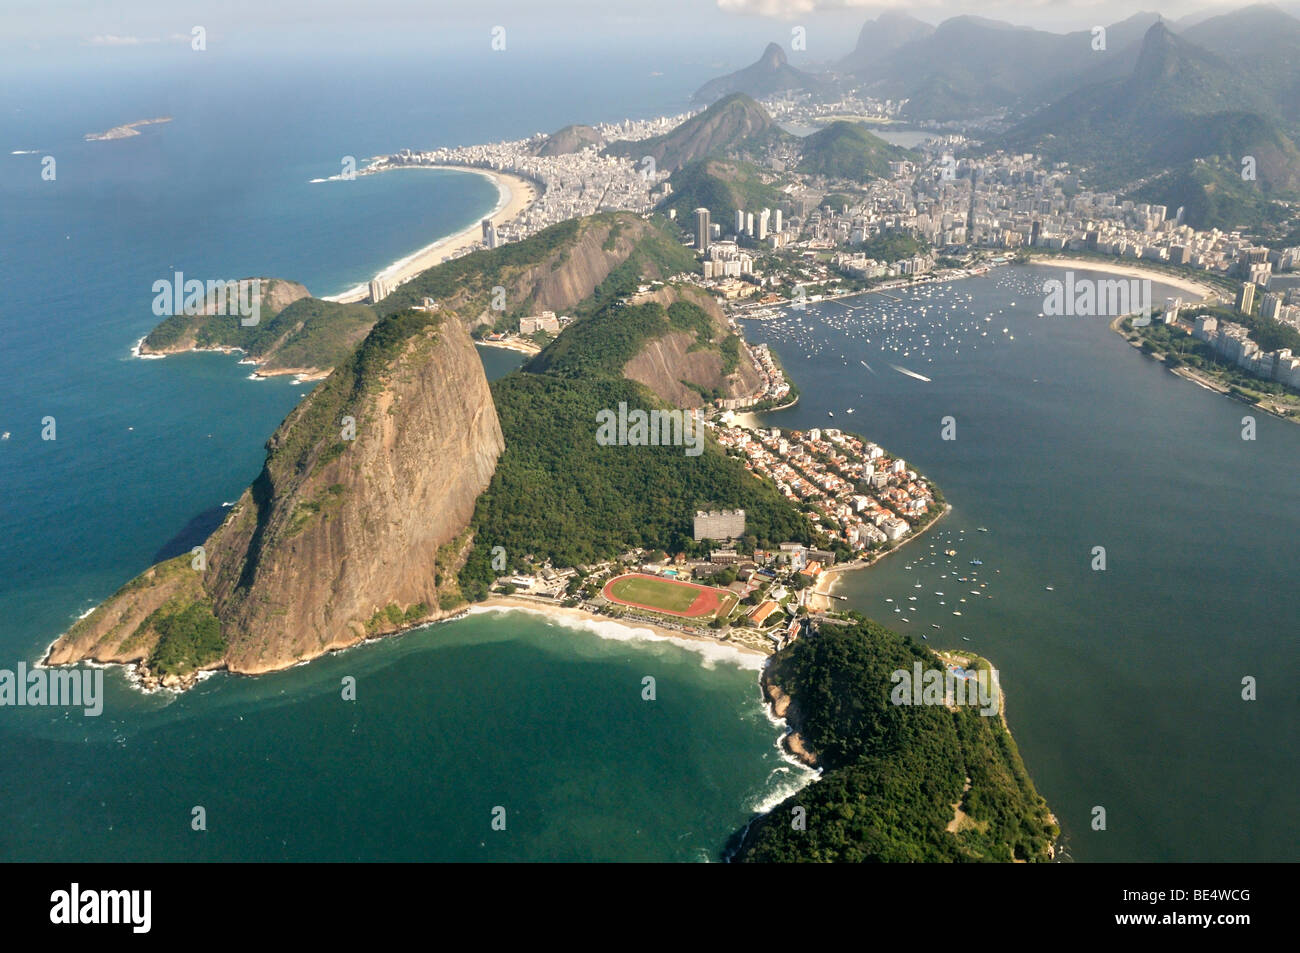 Aerial view of Rio de Janeiro and the Sugar Loaf, Brazil, South America - Stock Image